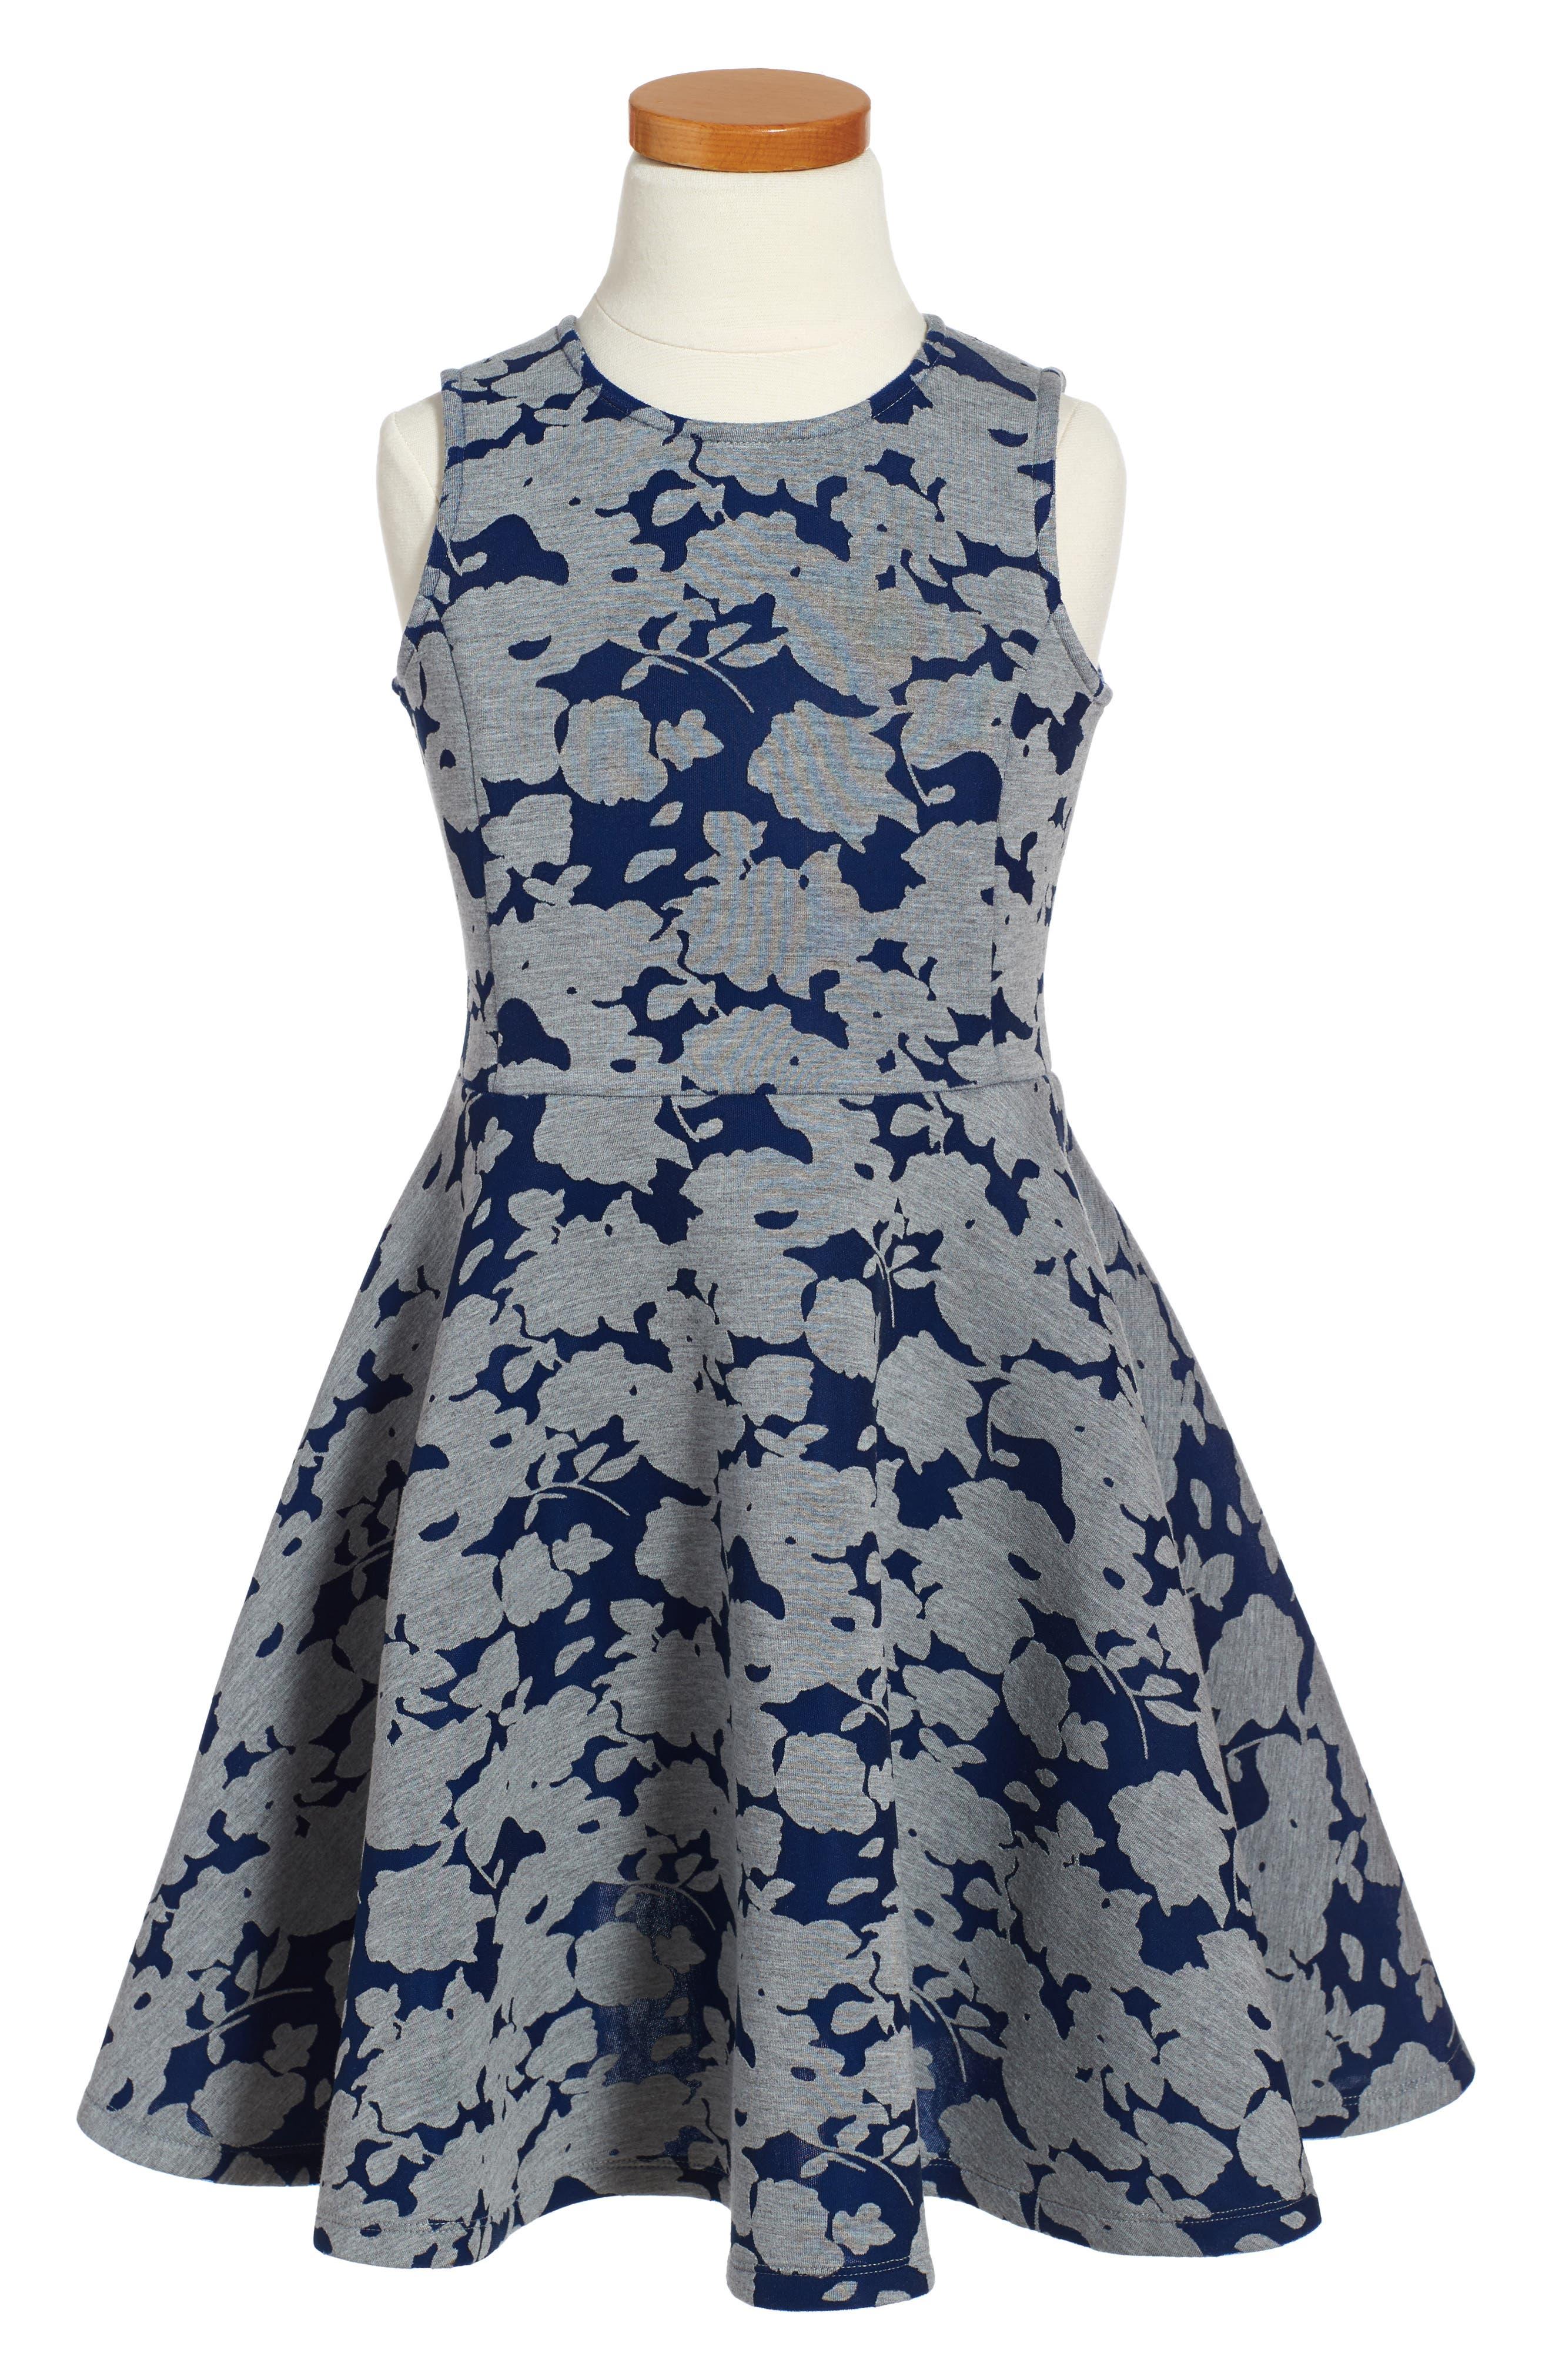 RUBY & BLOOM Floral Print Scuba Skater Dress